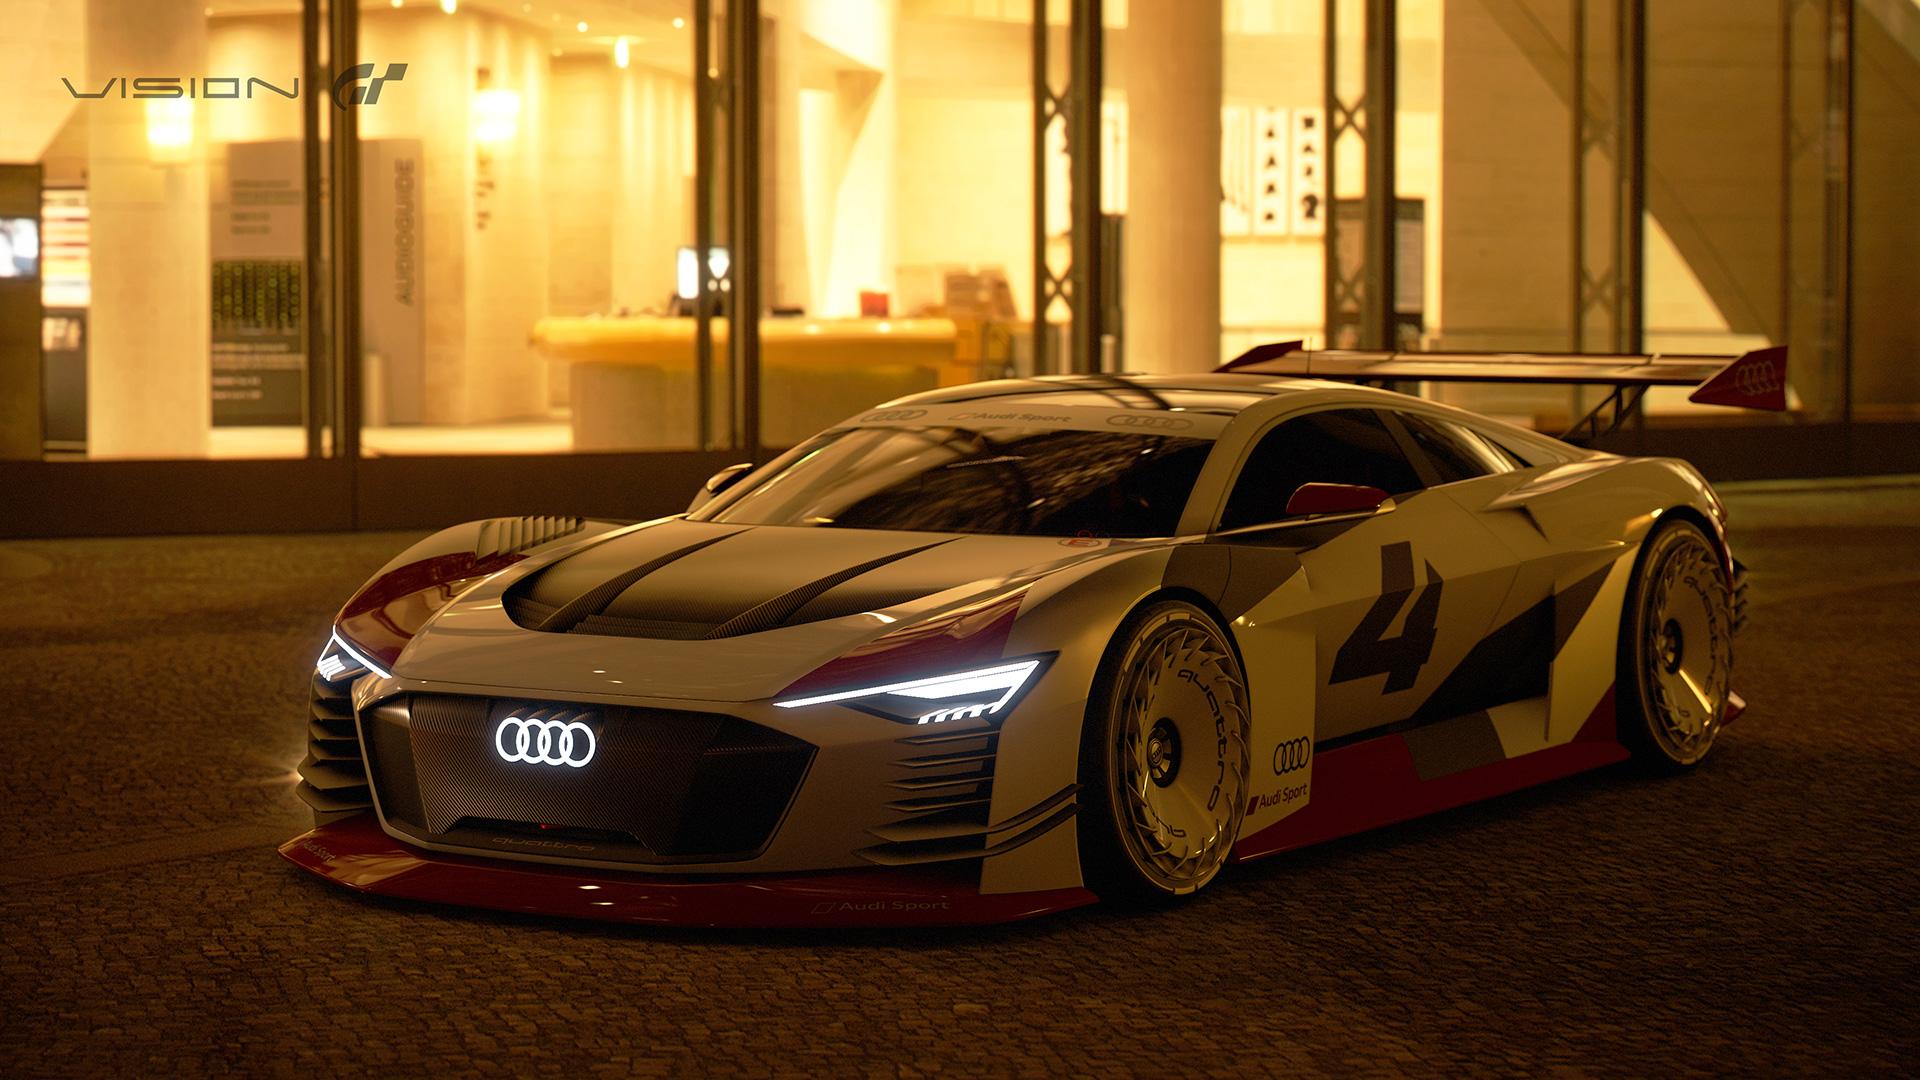 Audi E Tron Vision Gran Turismo Gran Turismocom